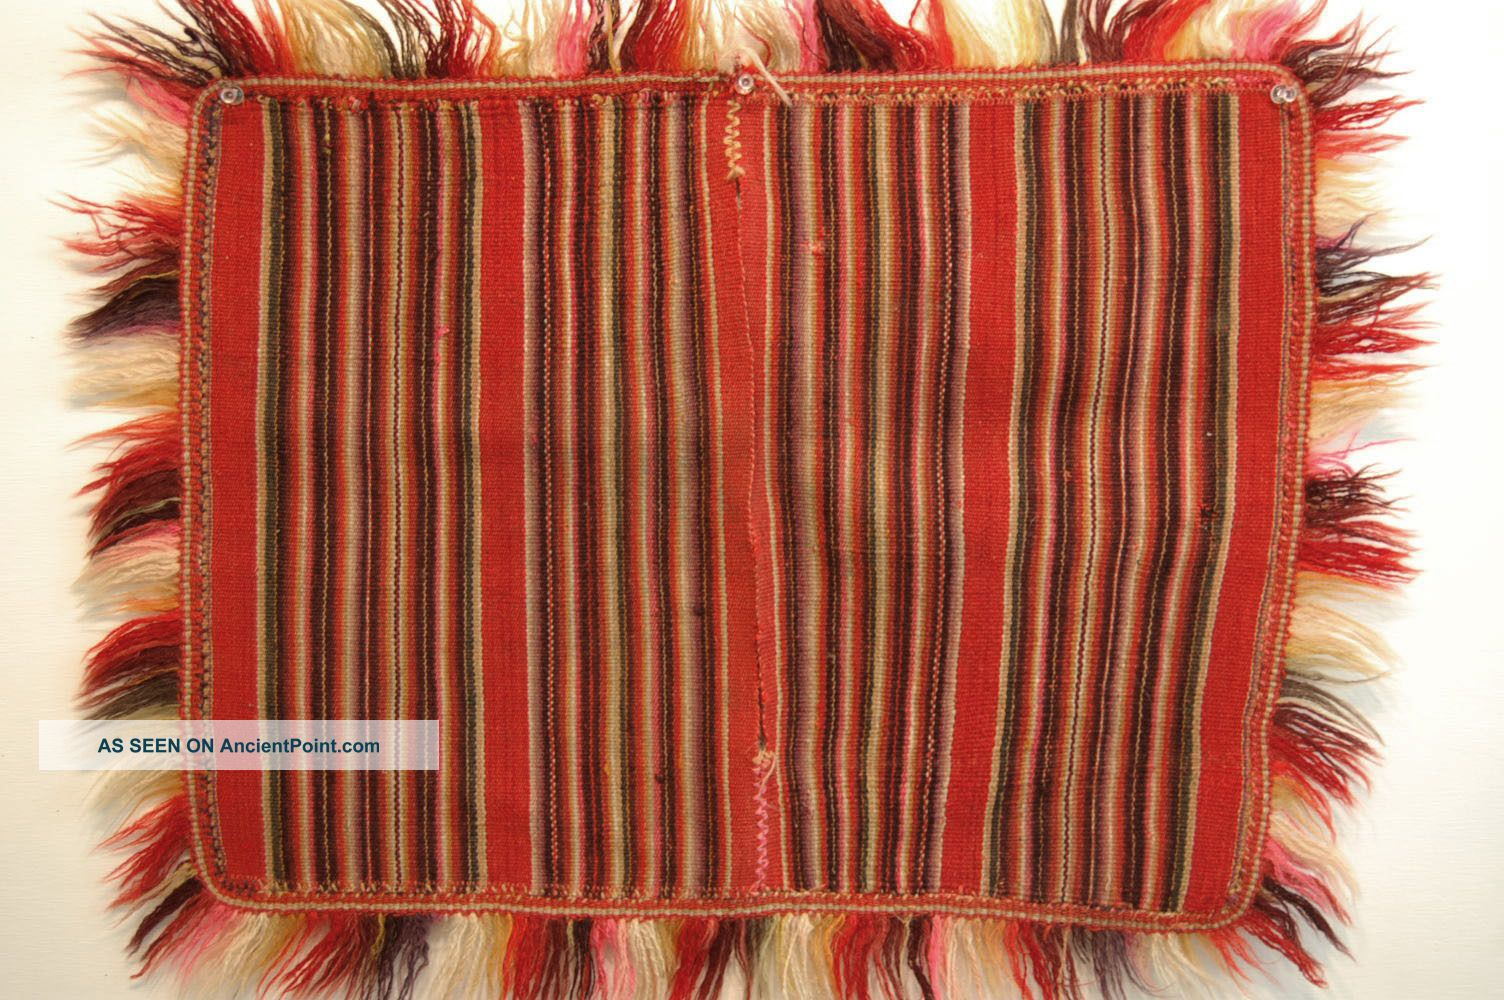 Child Poncho South American Weaving Aymara Peru Bolivia Chile Native Art Latin American photo